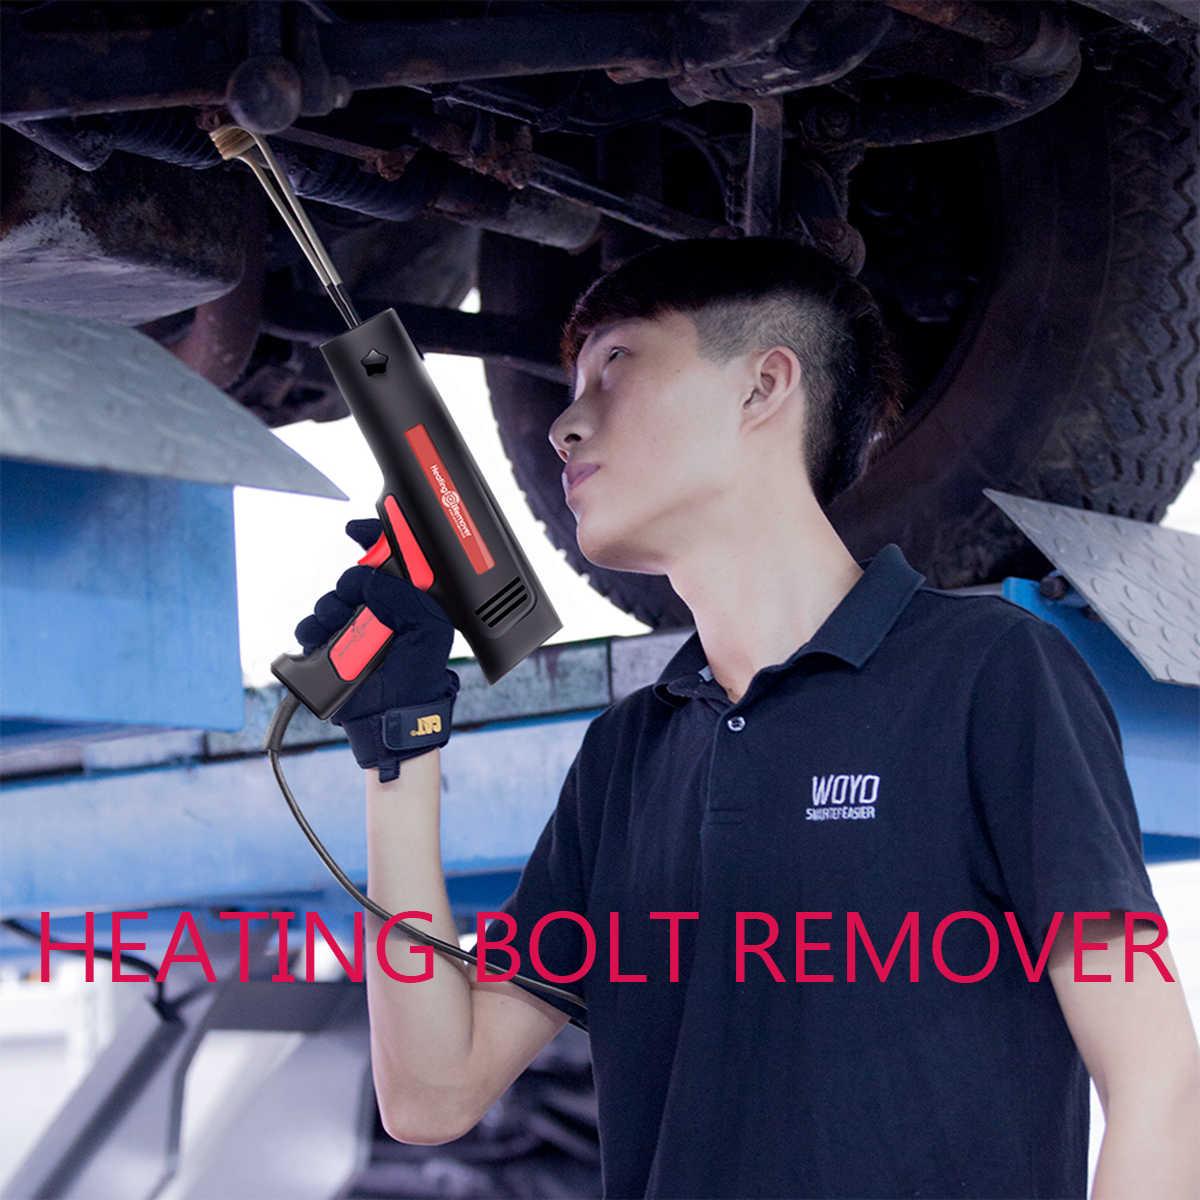 Pemanas Induksi Baut Panas Disassembler Rilis Berkarat Sekrup Alat Nut Cepat Pemisah Pemanasan Baut Remover Perbaikan Alat